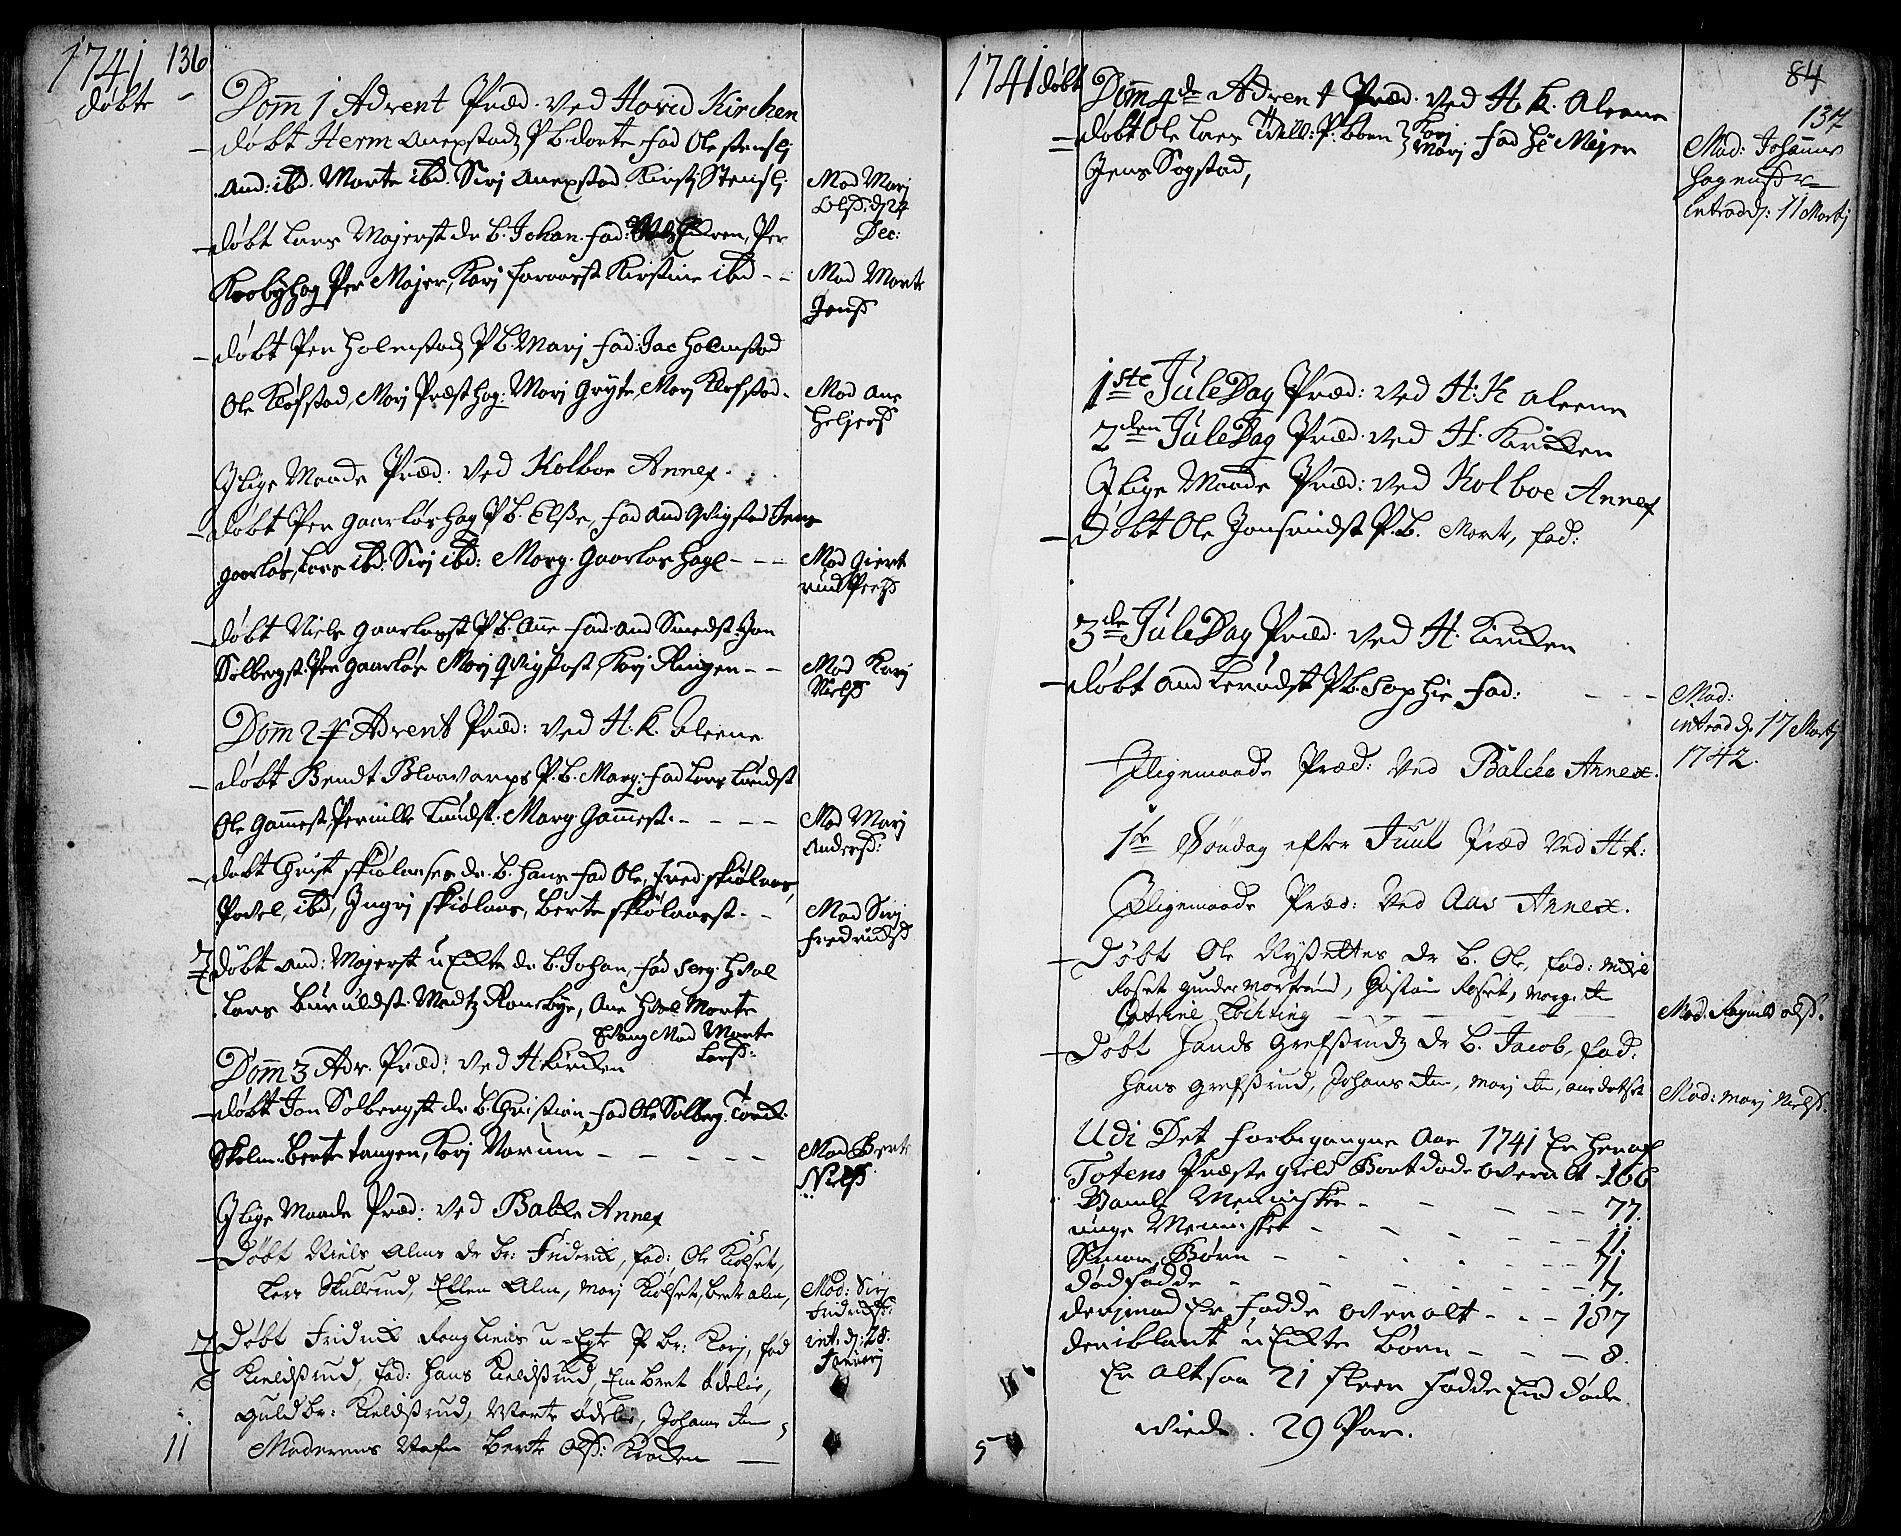 SAH, Toten prestekontor, Ministerialbok nr. 3, 1734-1751, s. 136-137